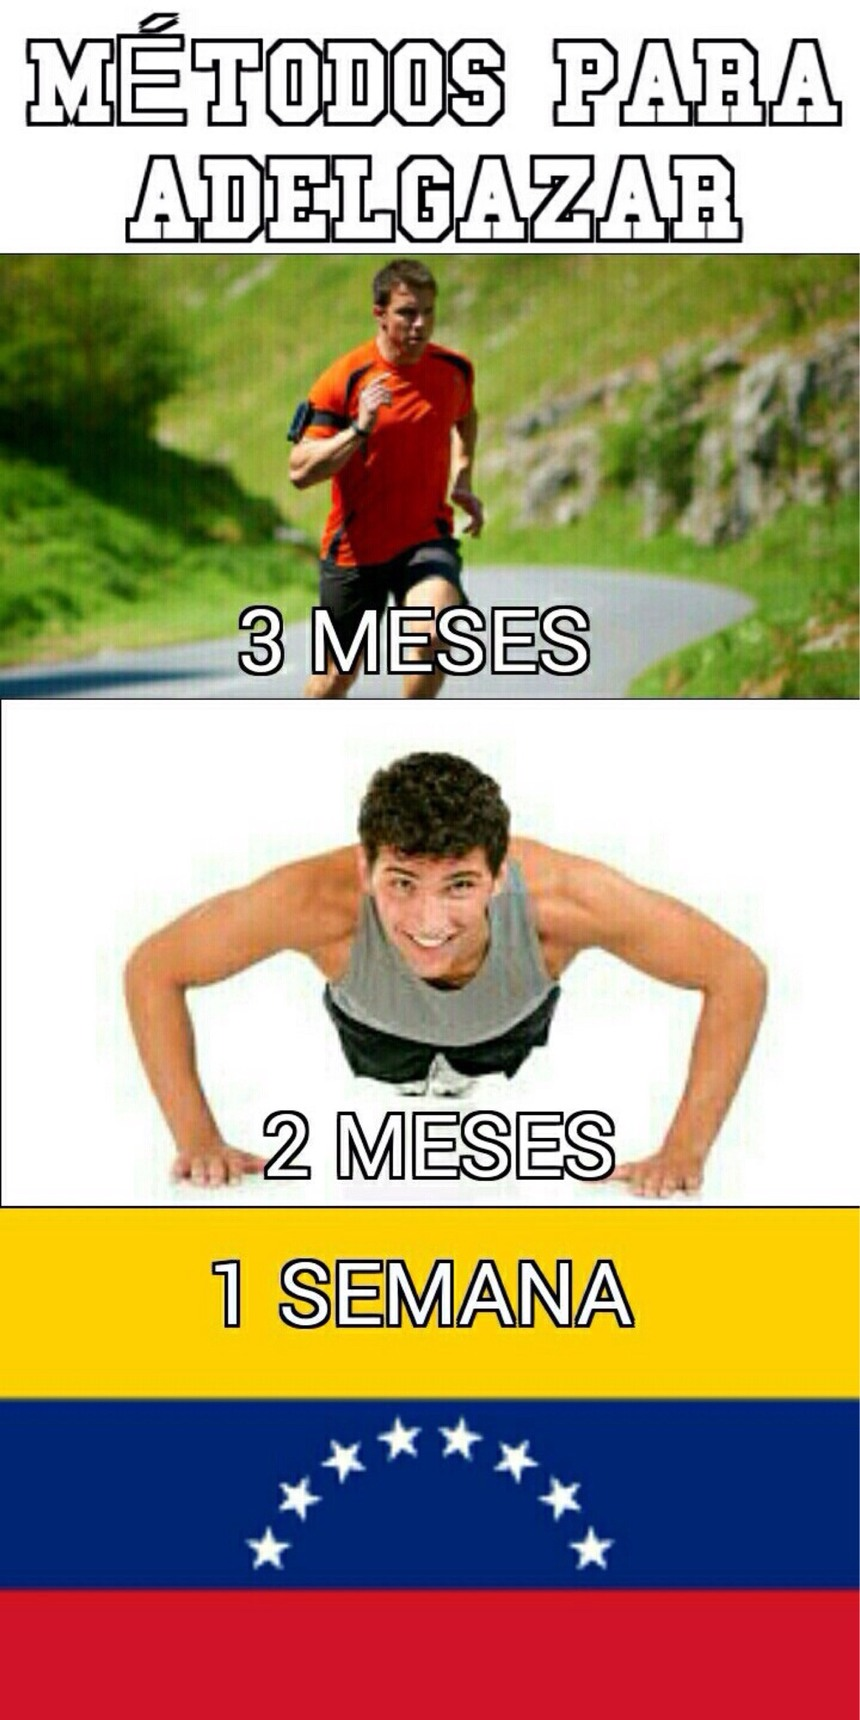 vamos a Venezuela!!! - meme